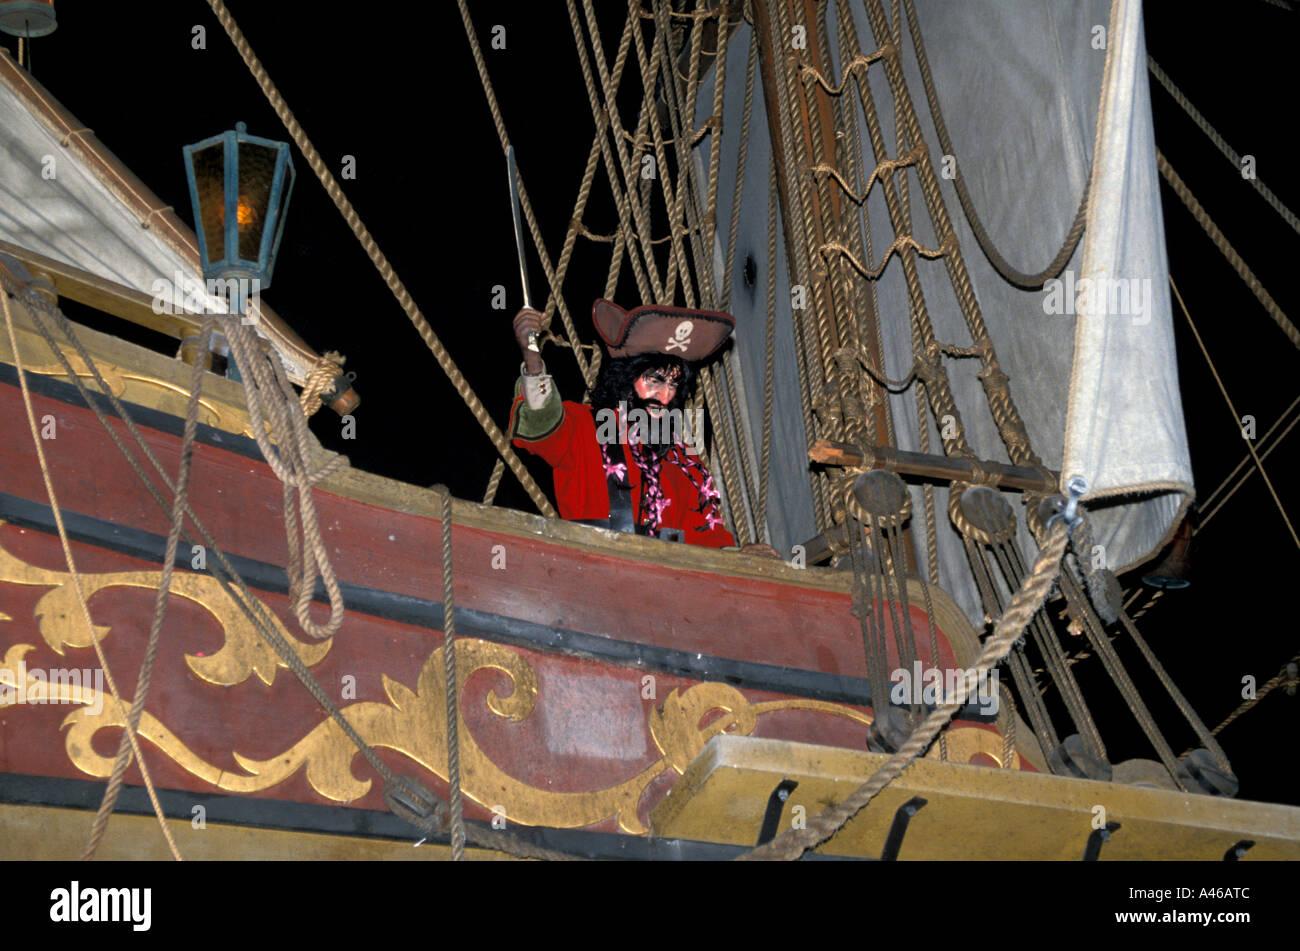 Disney World Magic Kingdom Pirates of Caribbean - Stock Image